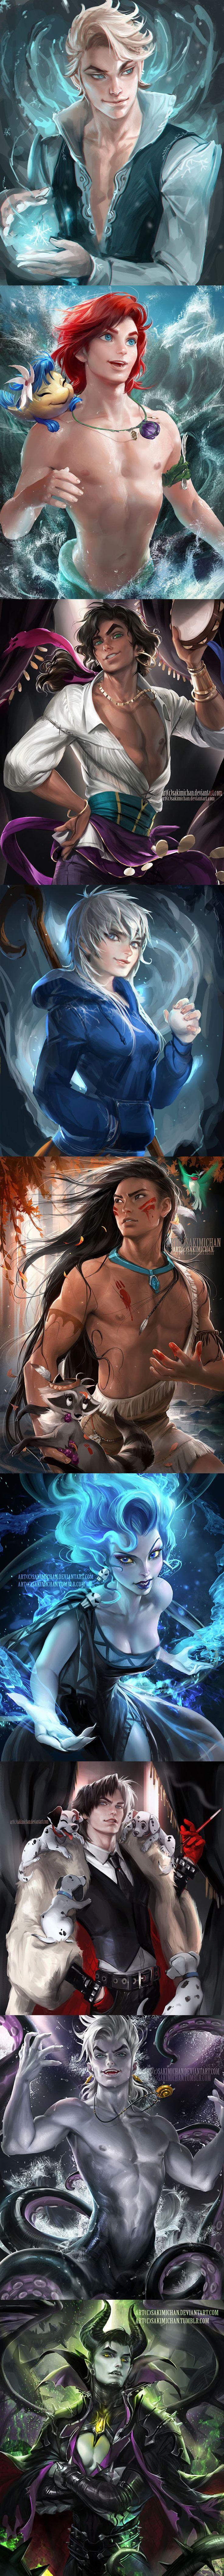 Genderbent Characters by sakimichan on deviantart.com